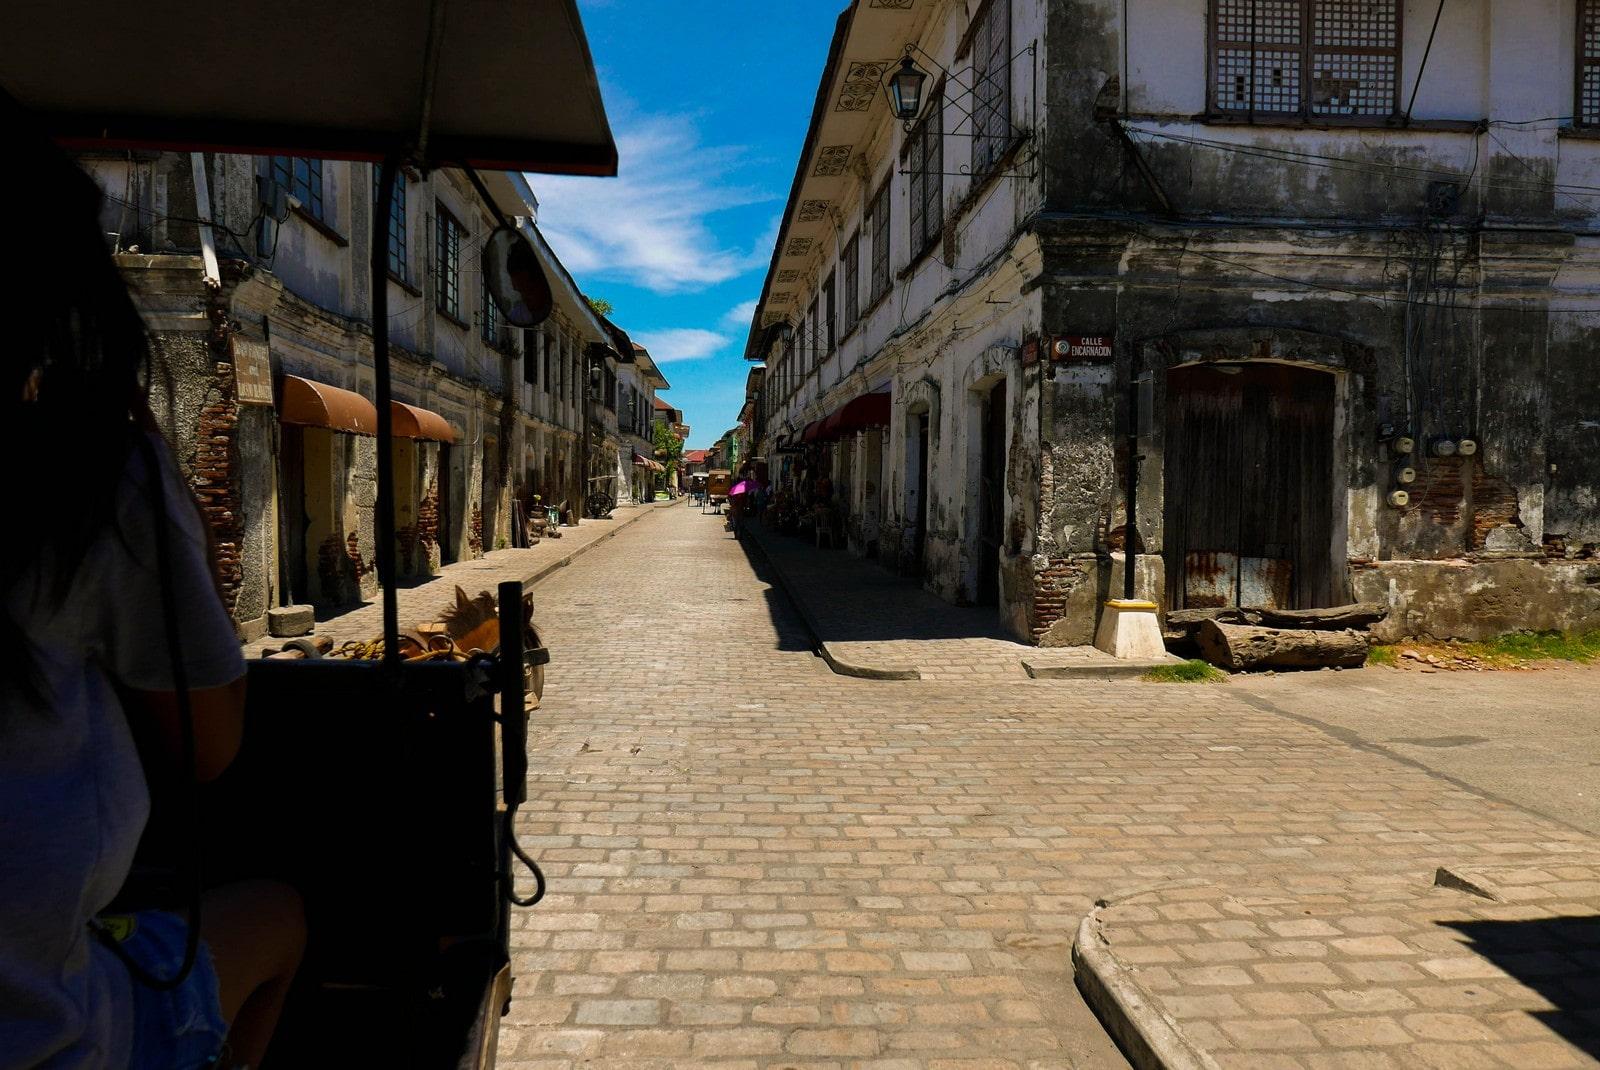 Calle Crisologo in Ilocos